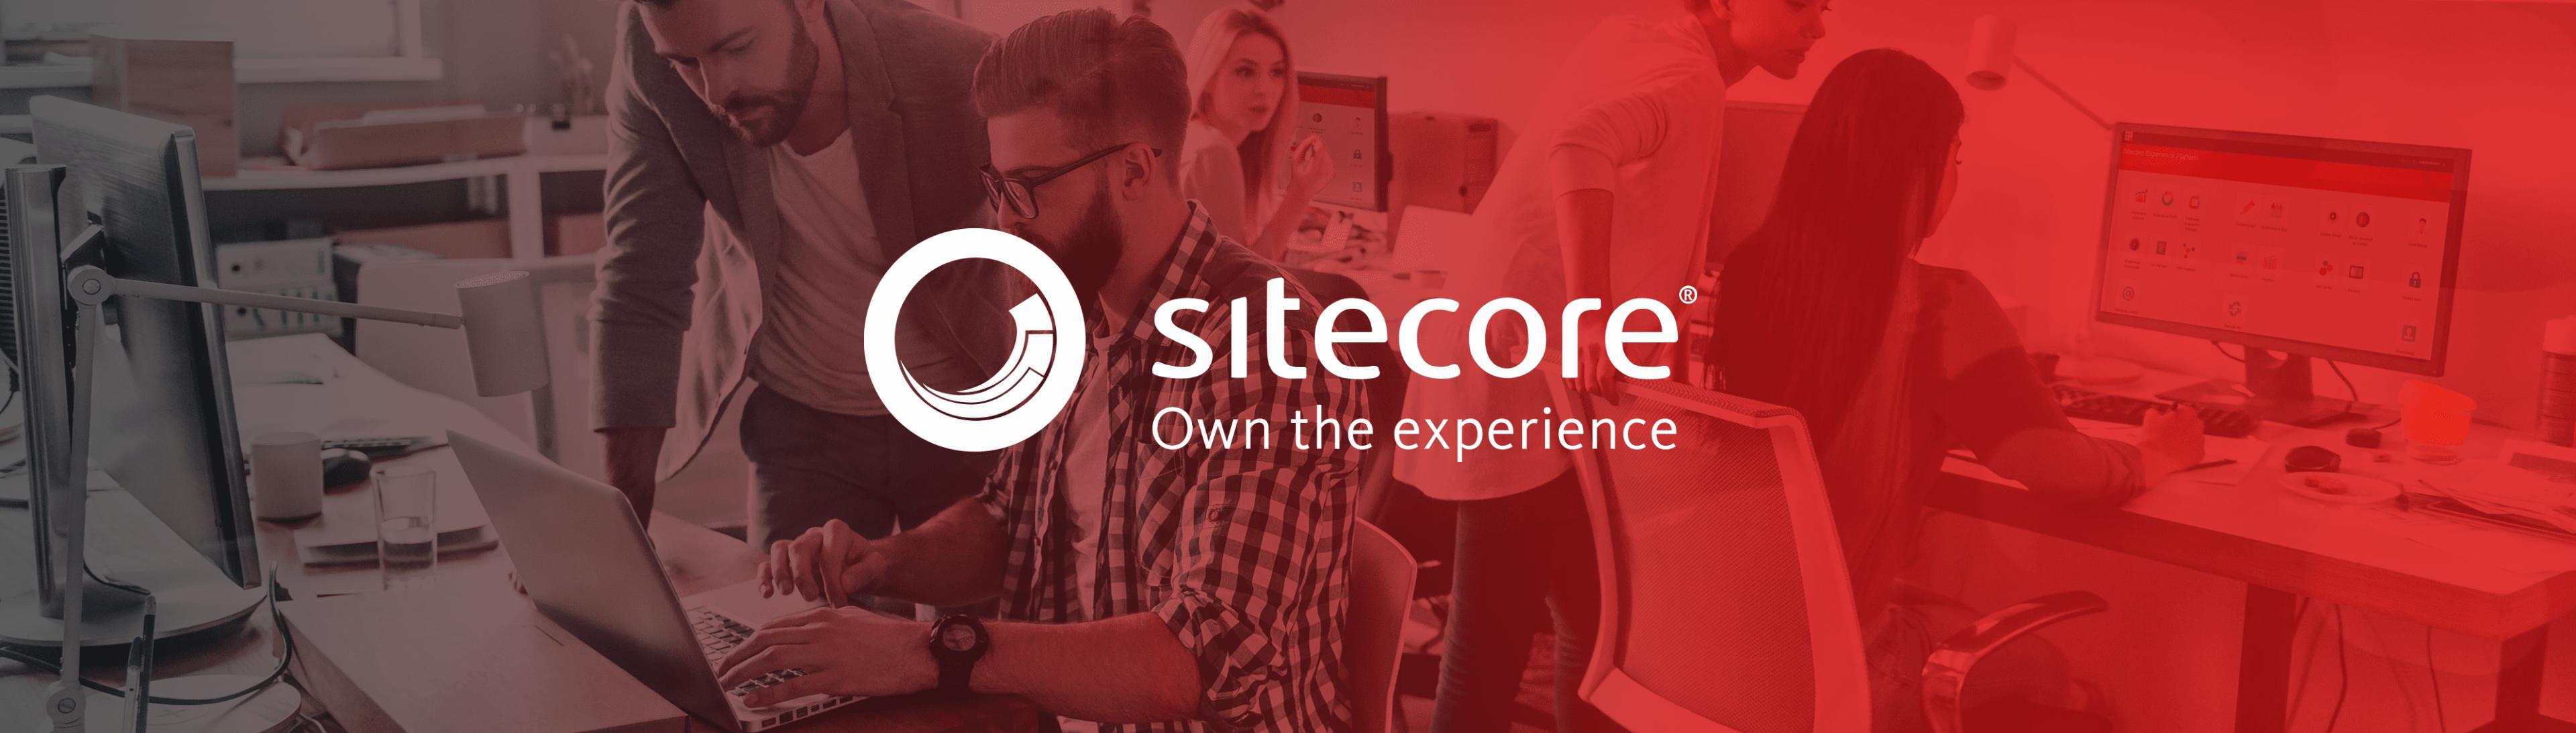 Sitecore Experience Profile